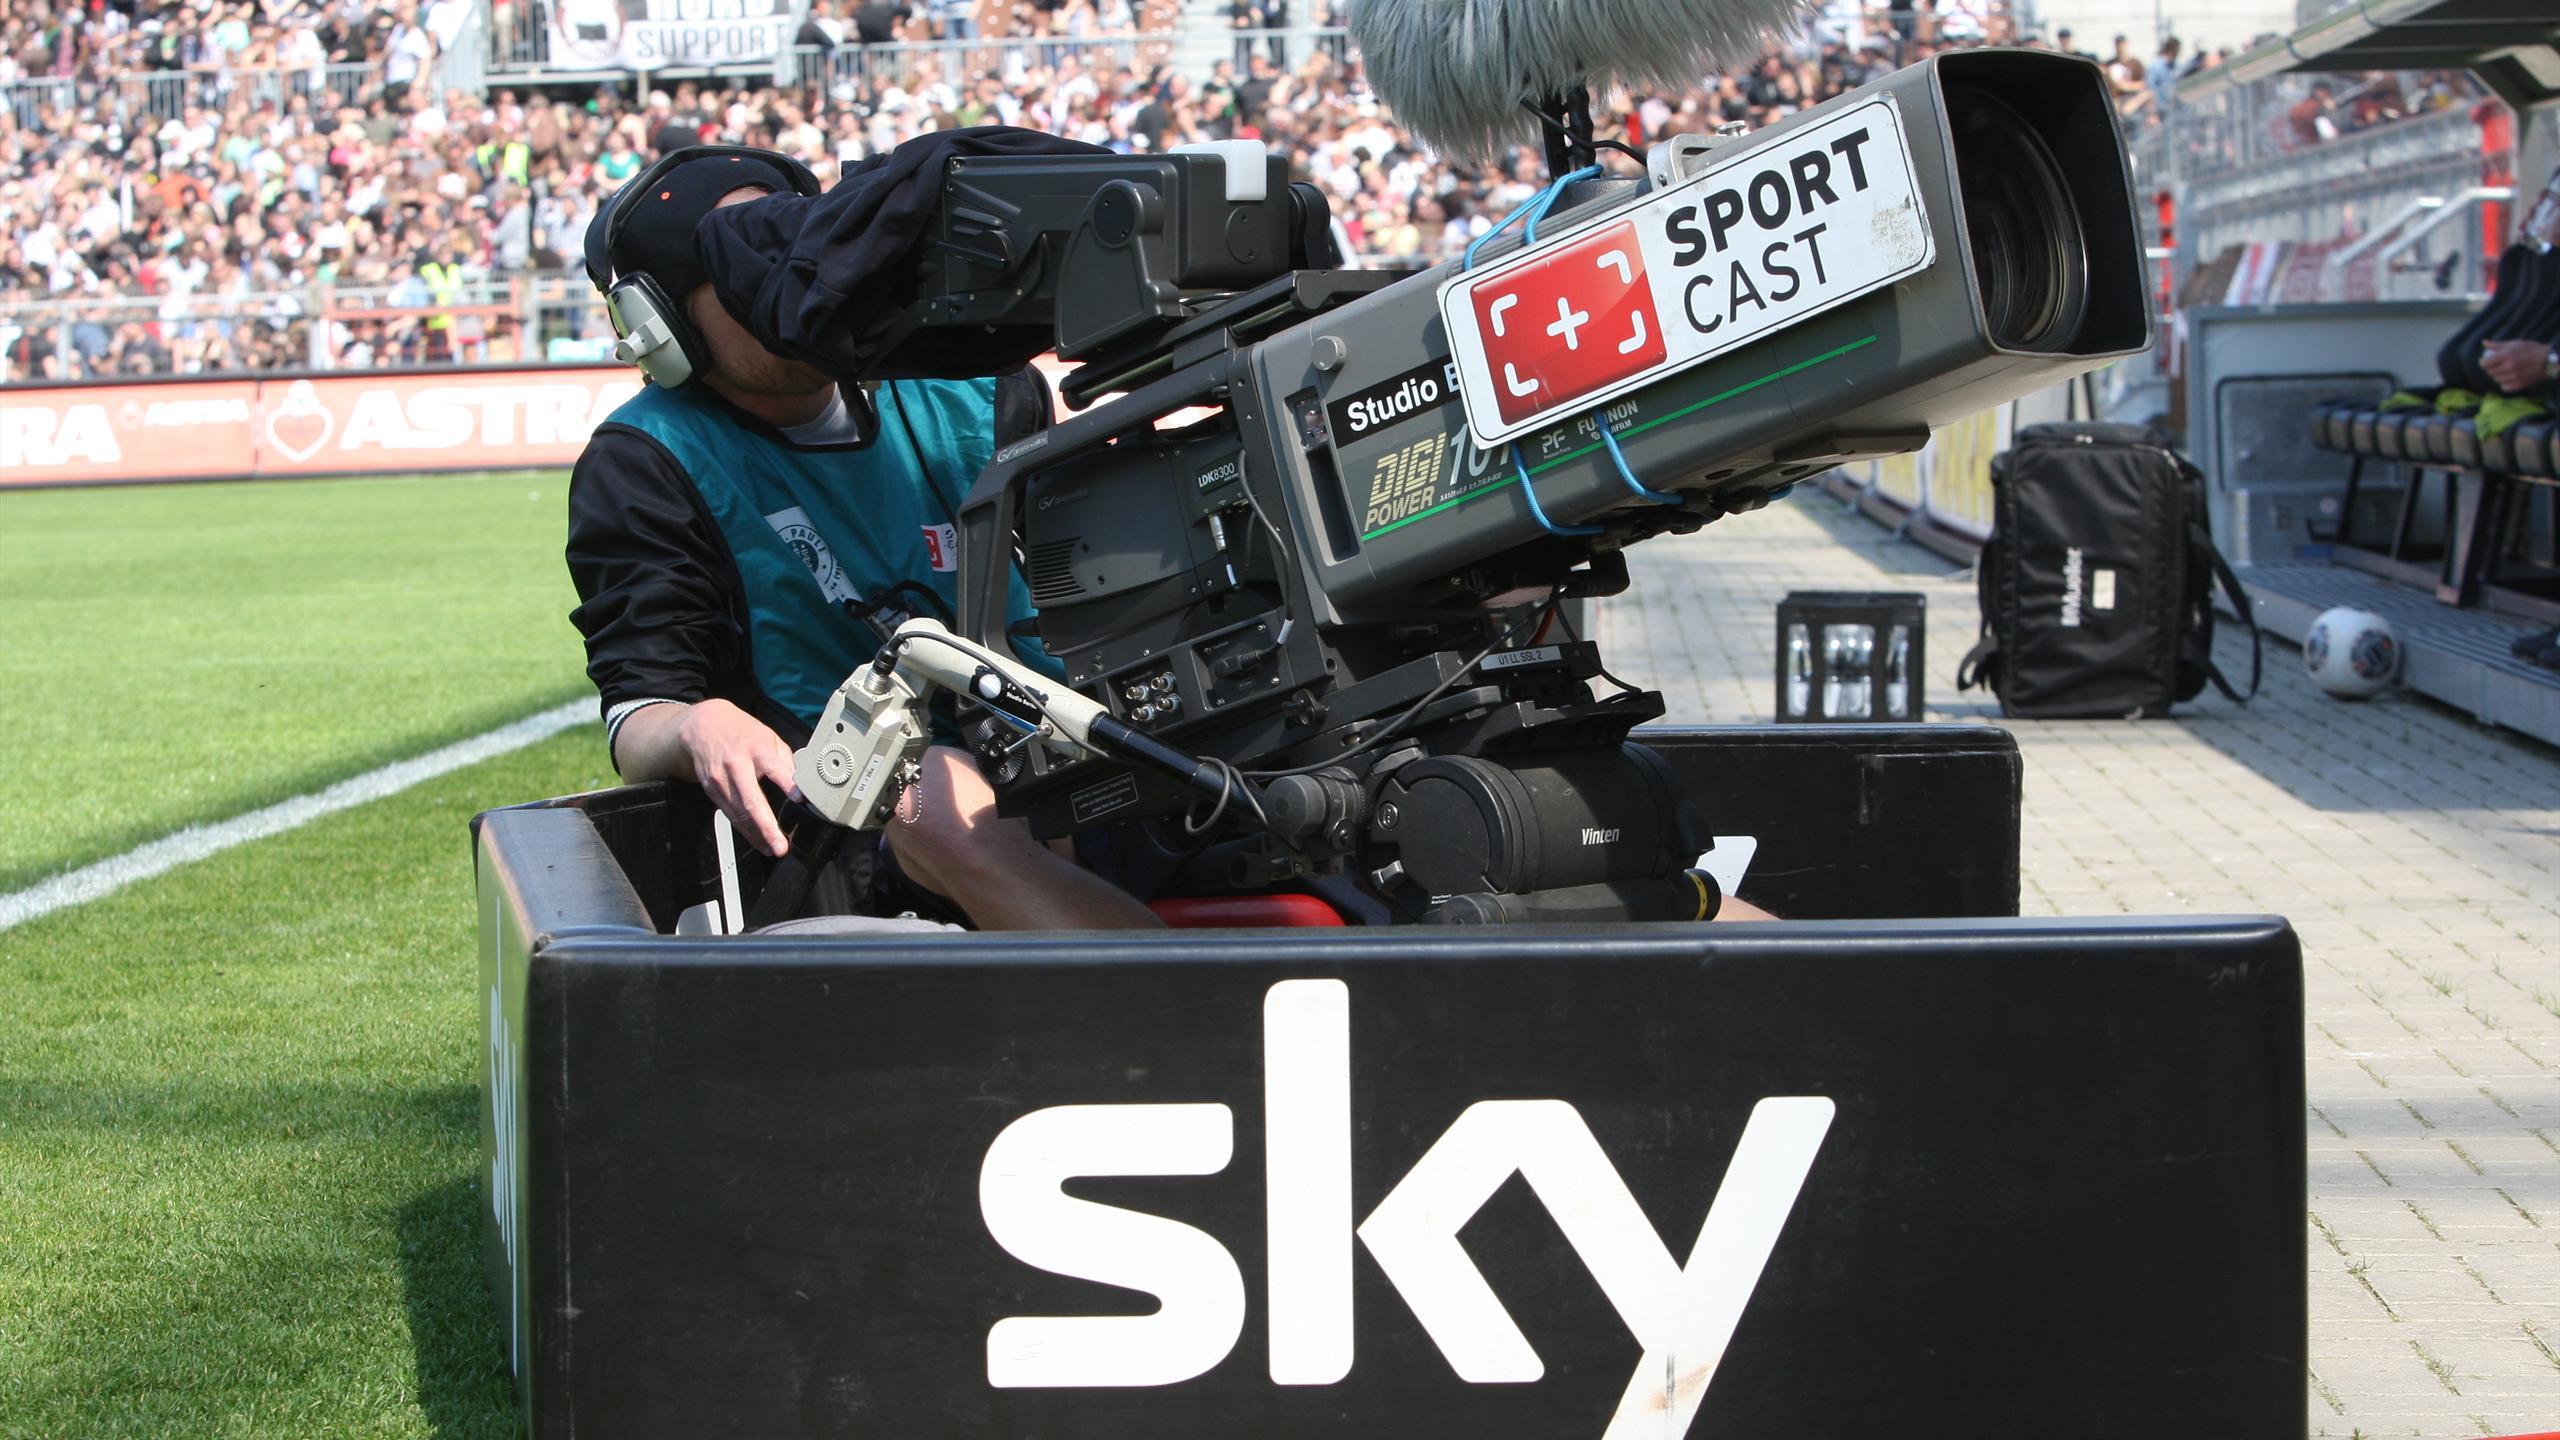 Sky übertragungsrechte